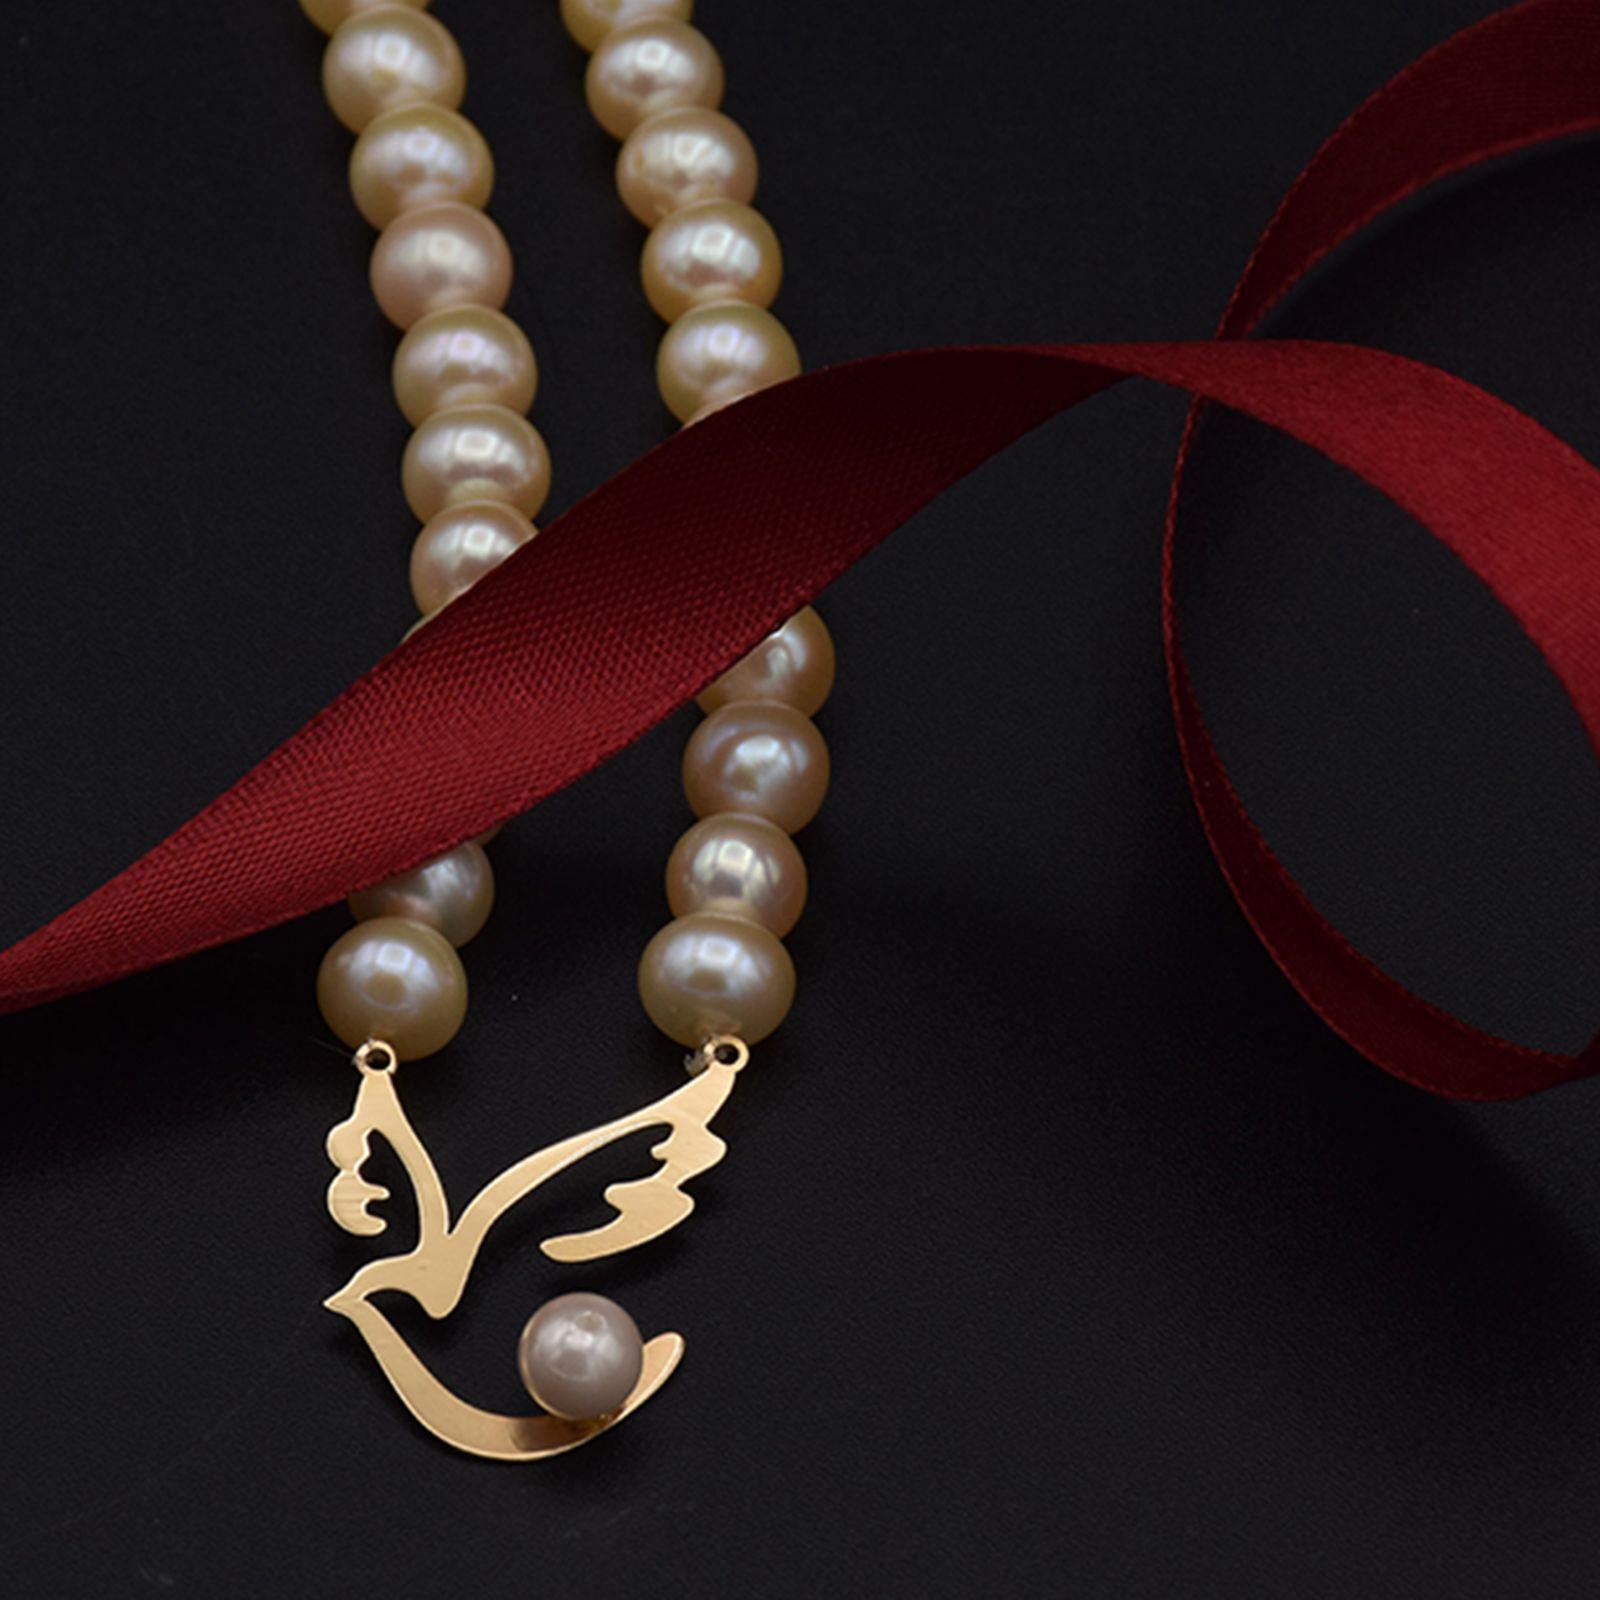 گردنبند طلا 18 عیار زنانه آمانژ طرح پرستو کد 896D3386 -  - 2